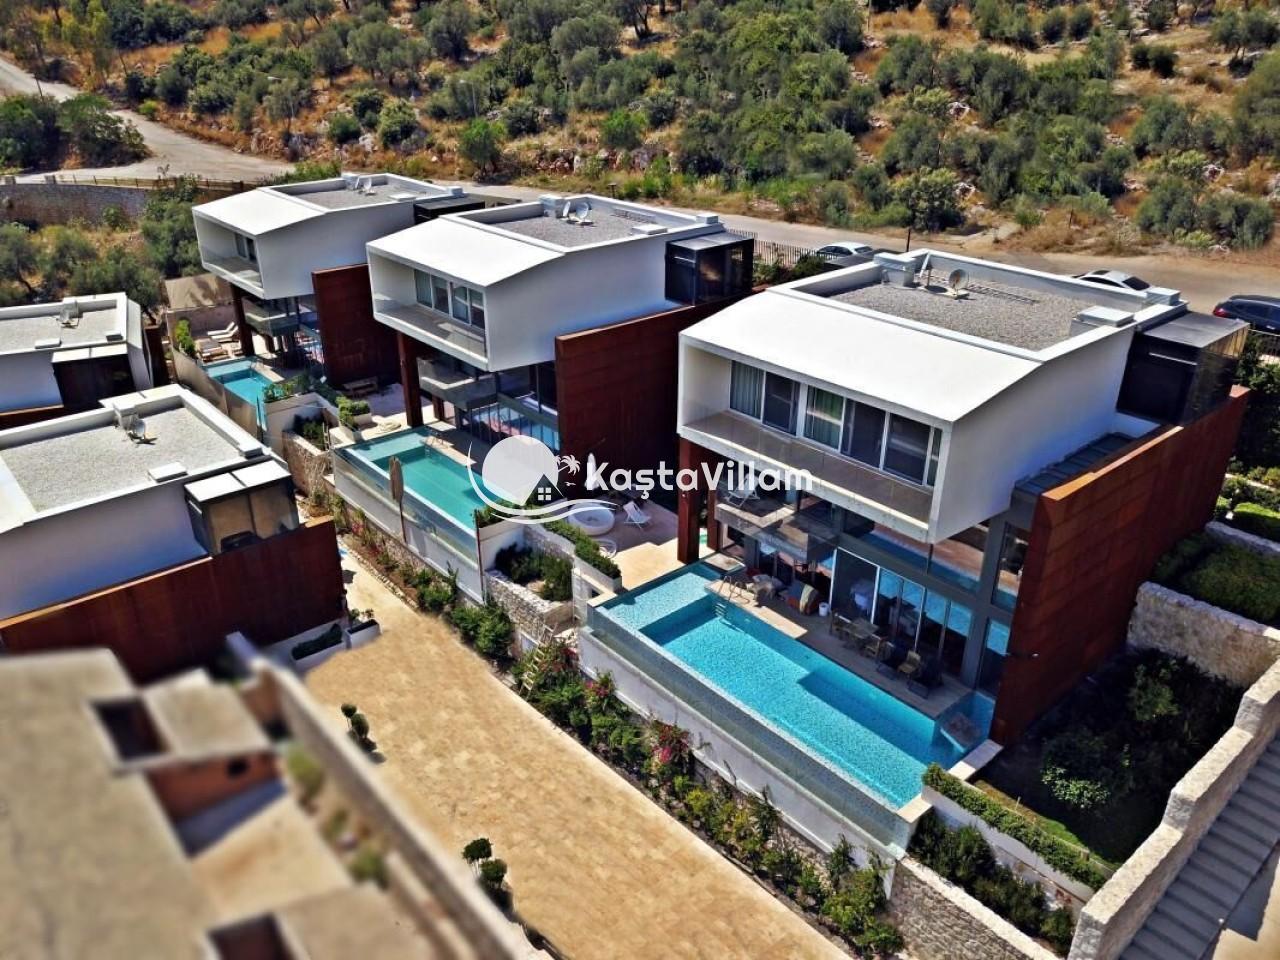 VİLLA ALTES 3 | Kaş Kiralık Villa, Kaş Yazlık Vi - Kaştavillam